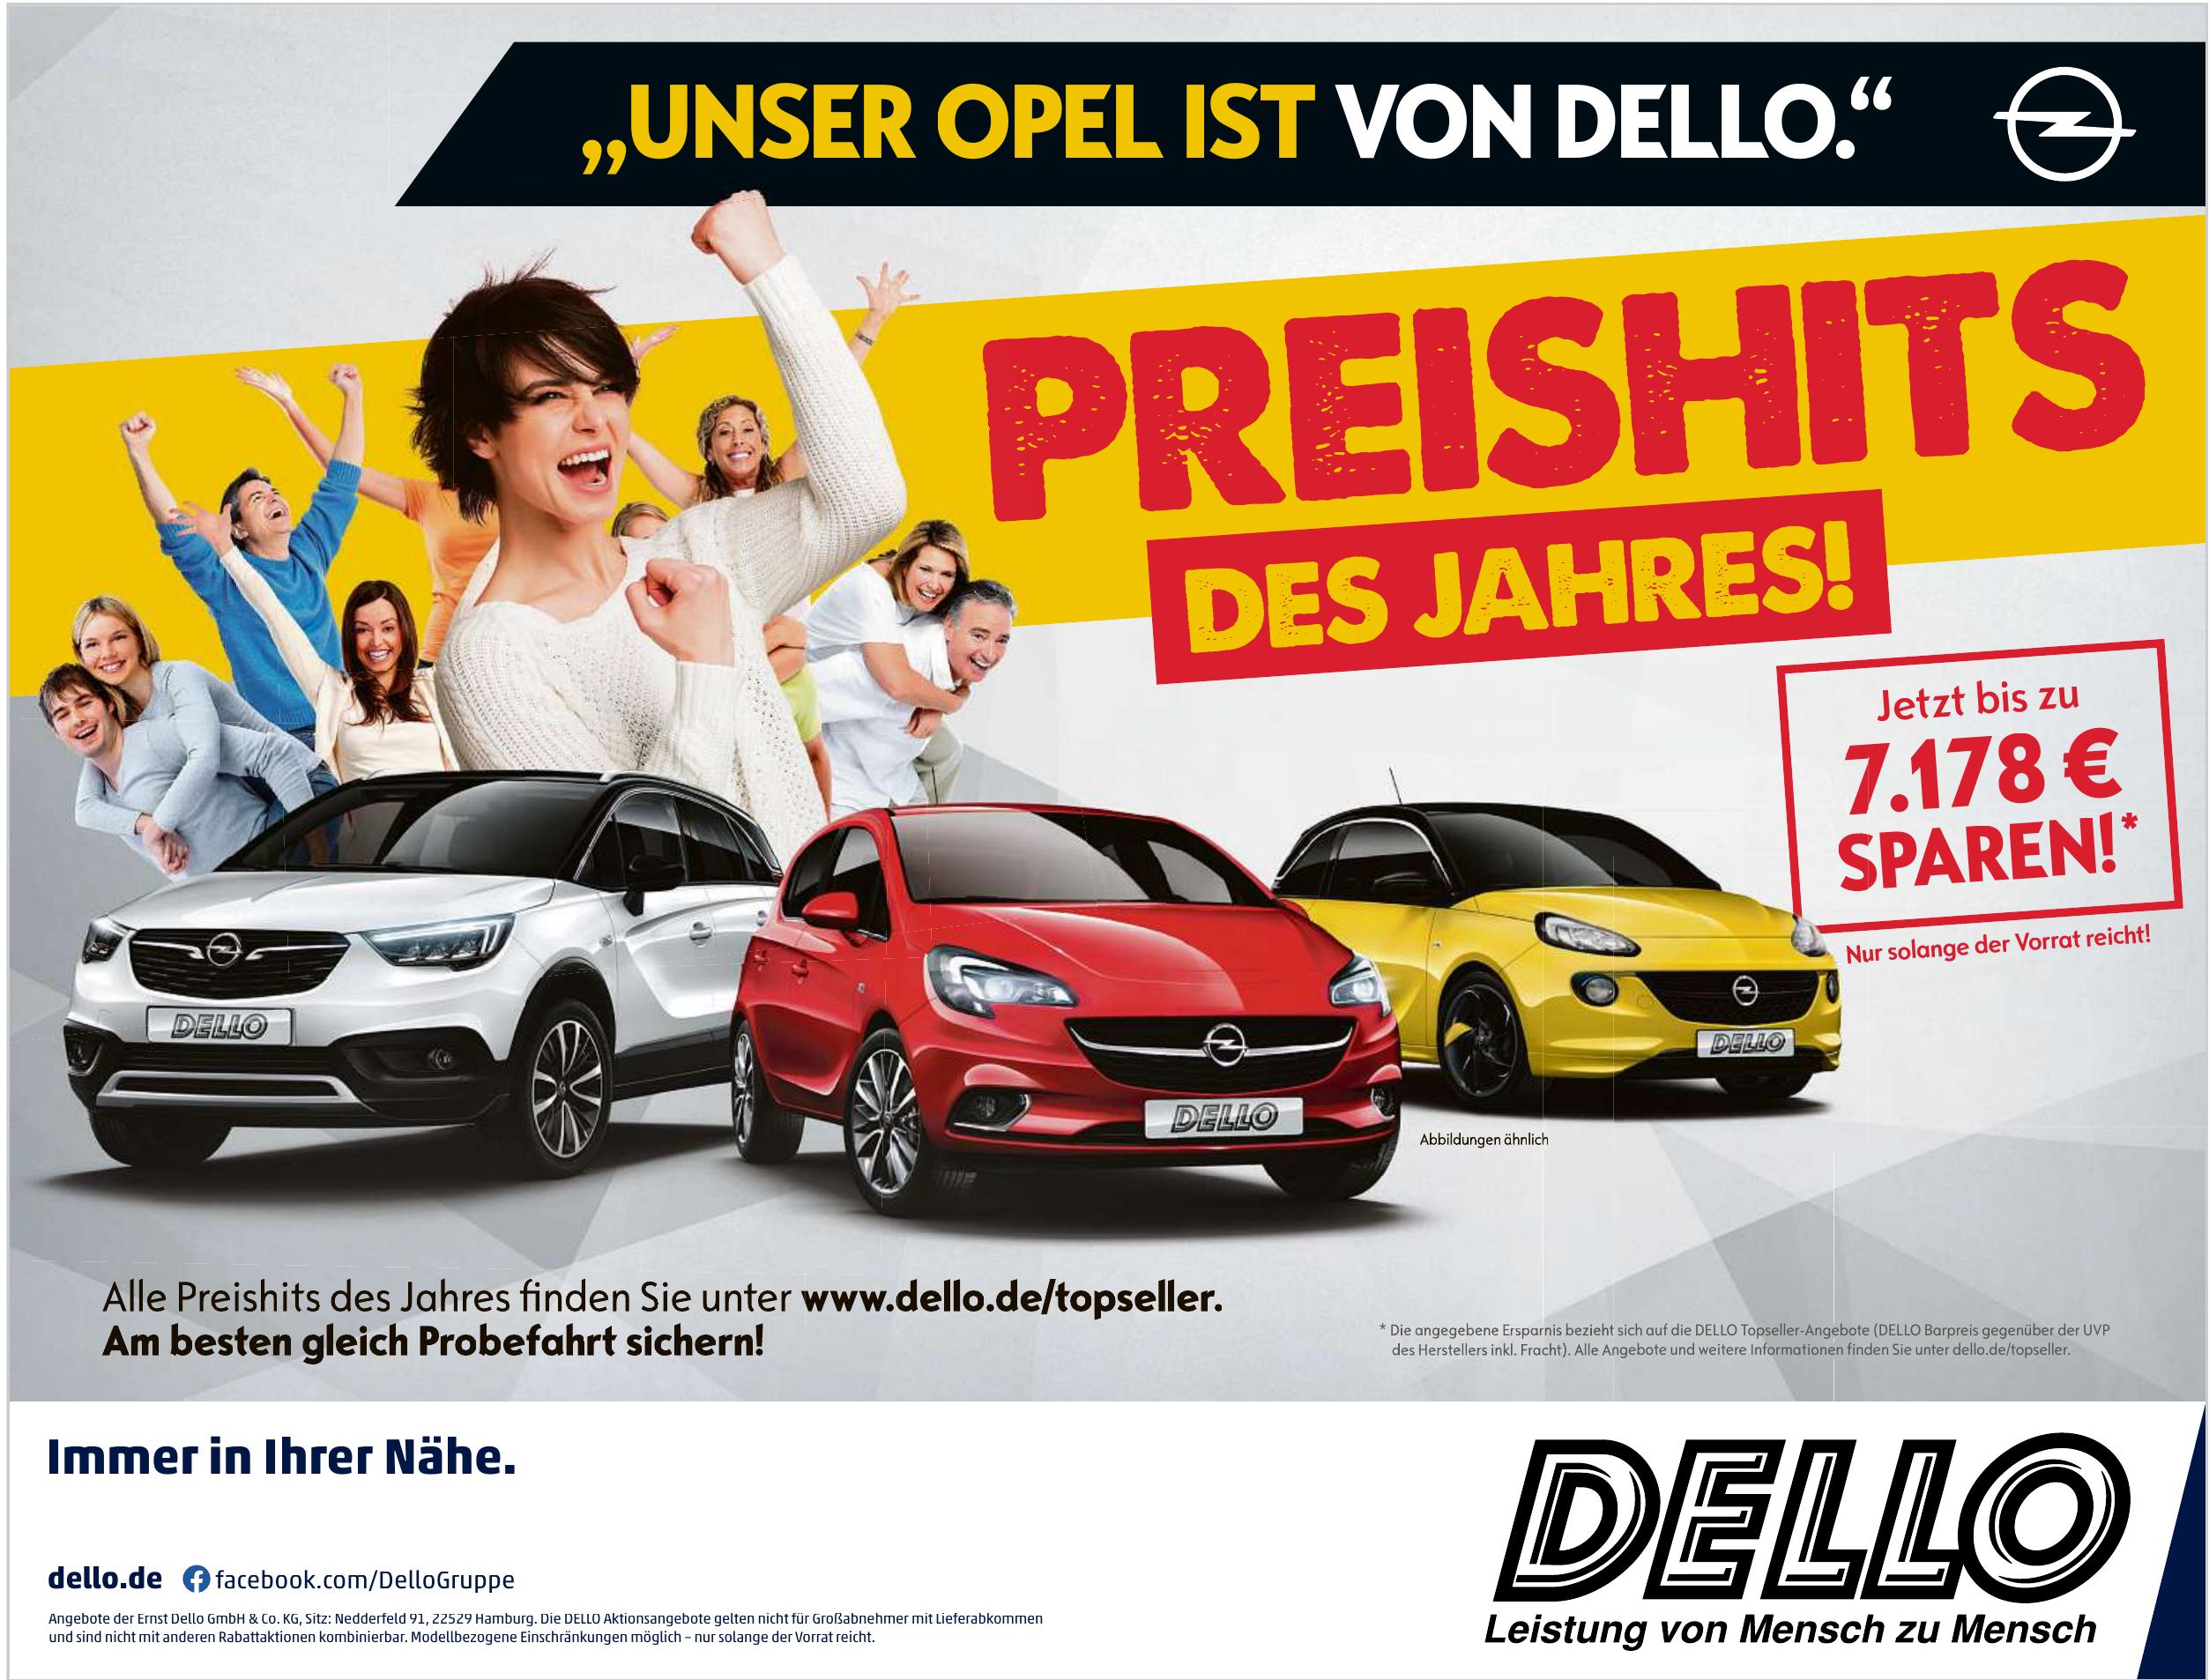 Ernst Dello GmbH & Co. KG